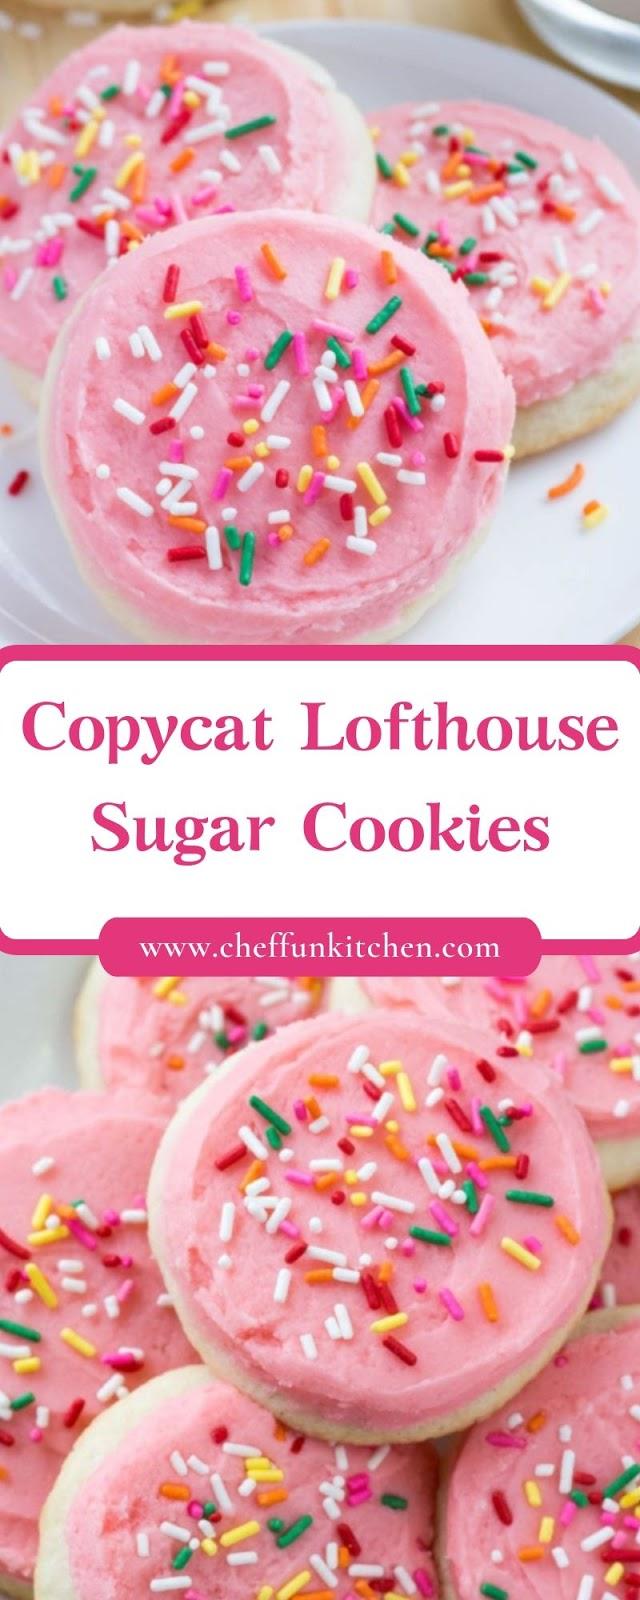 Copycat Lofthouse Sugar Cookies